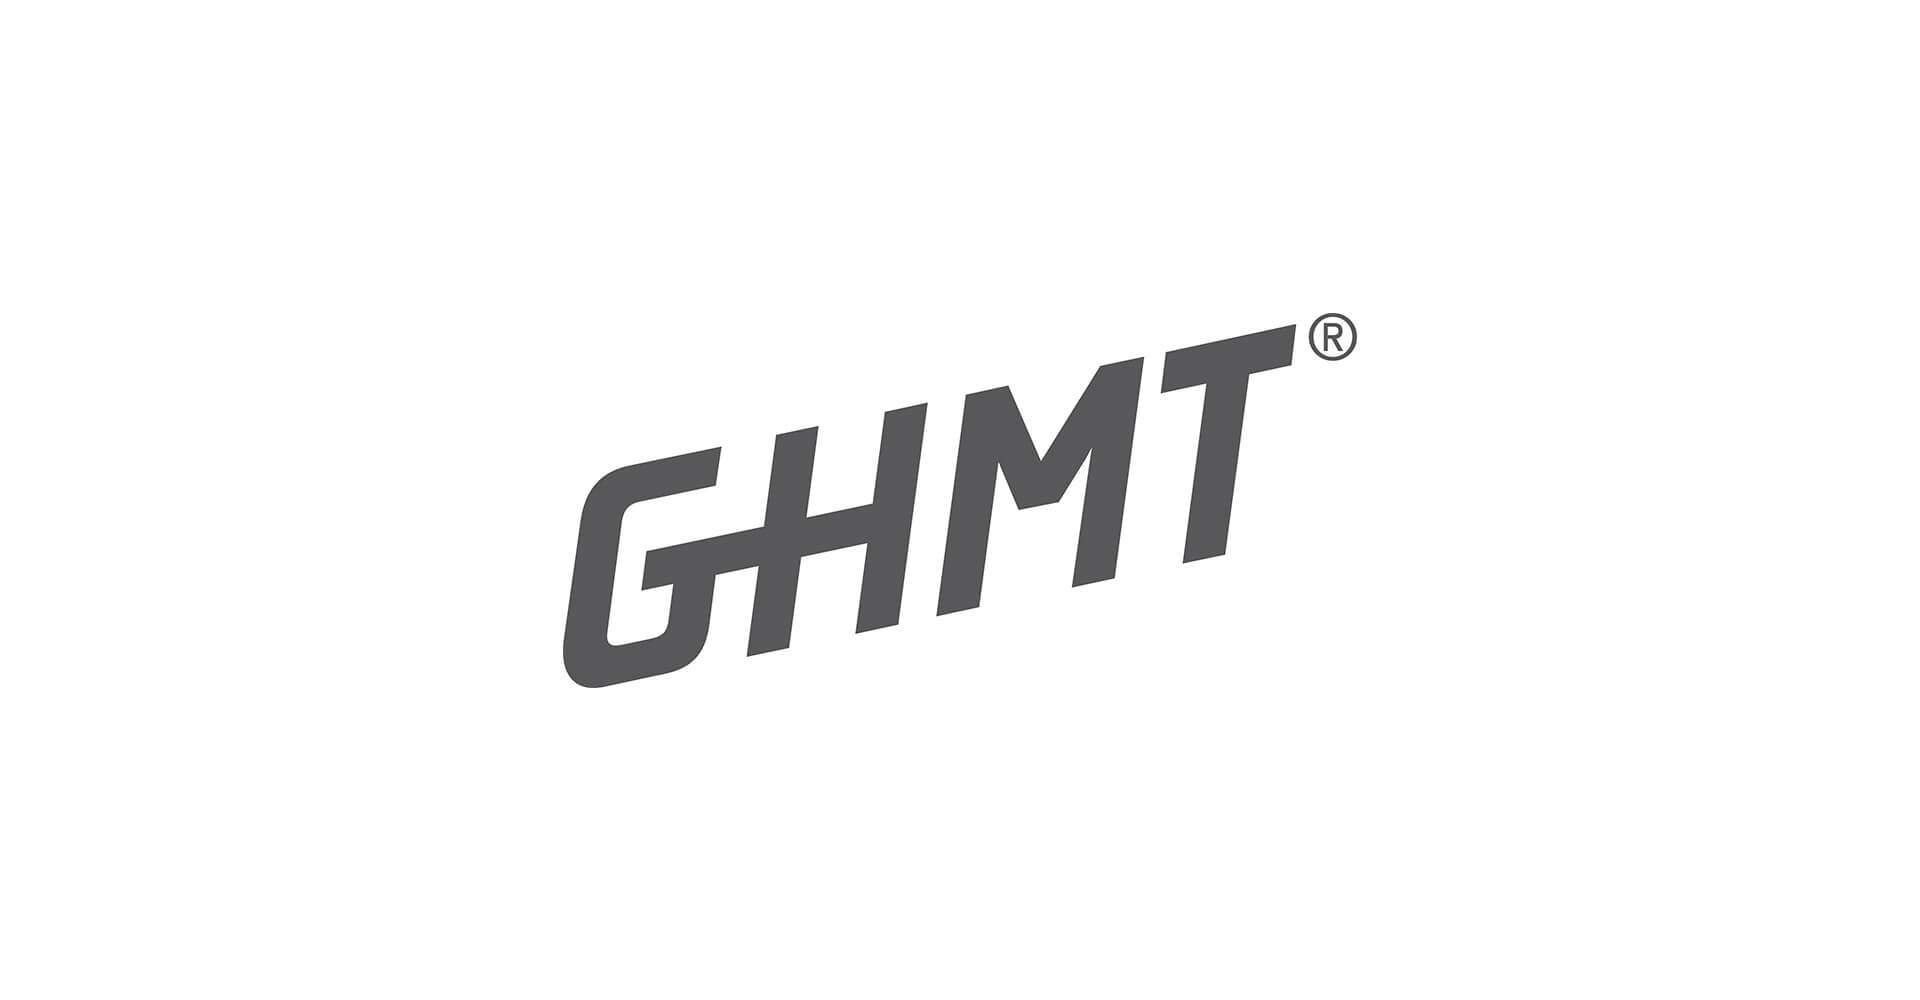 GHMT Logo